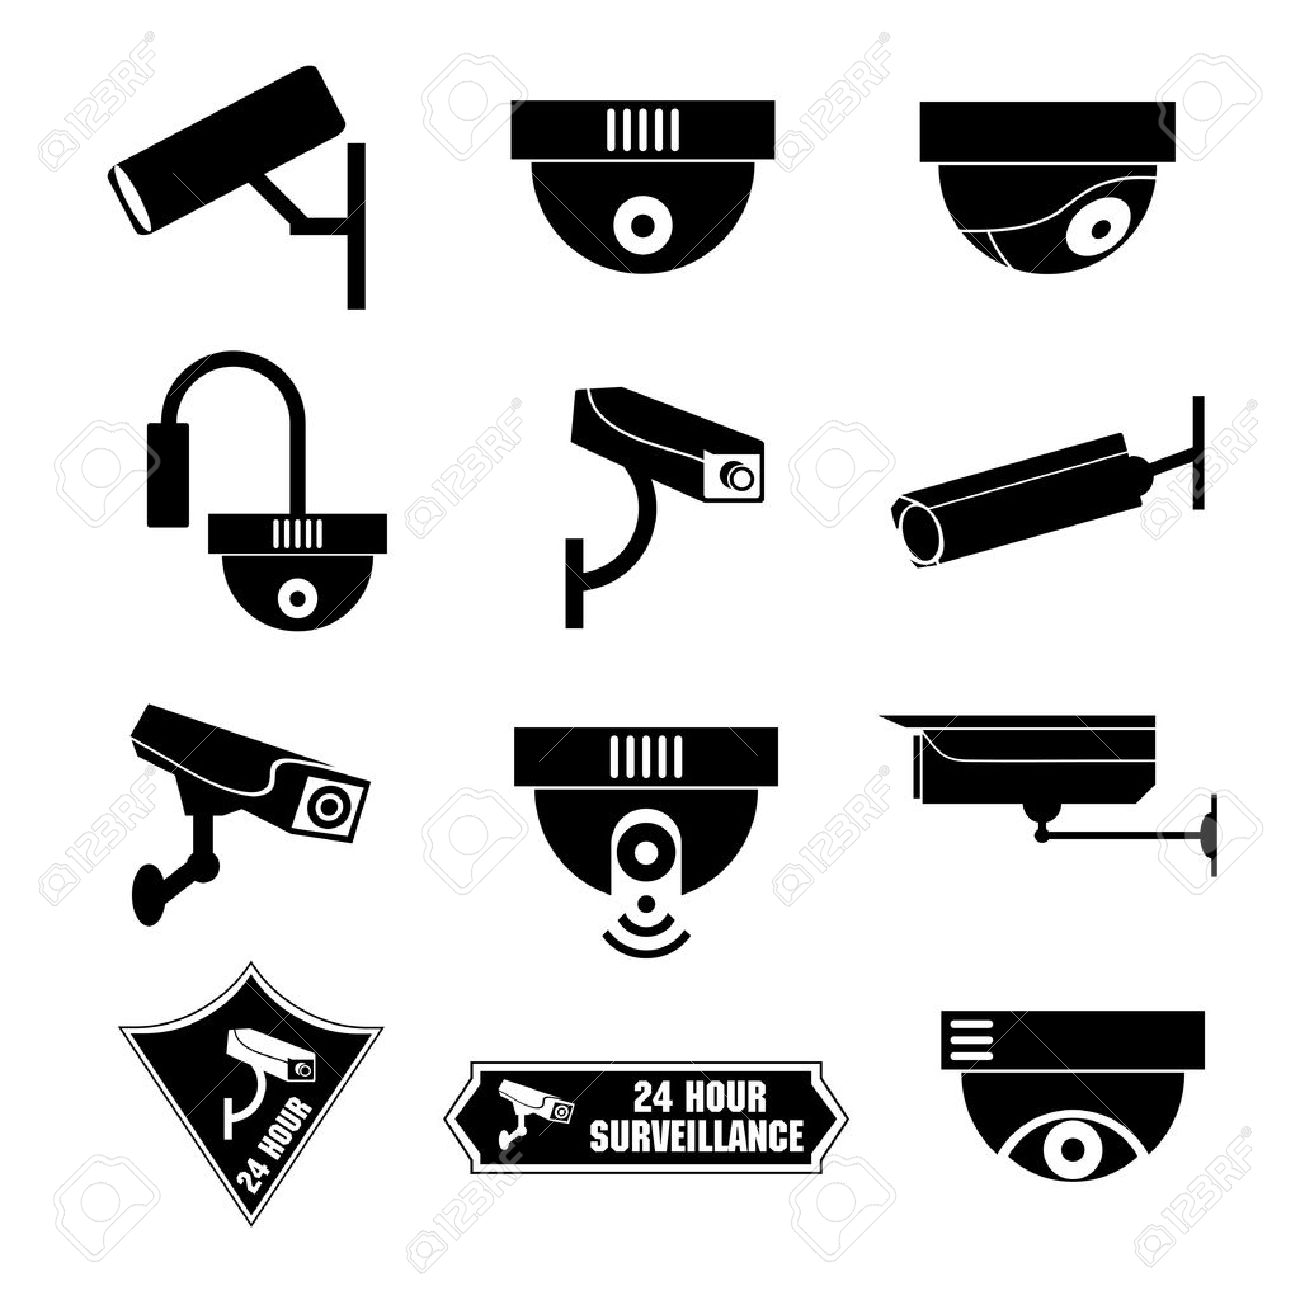 Video surveillance, cctv icon, vector illustration - 24951899